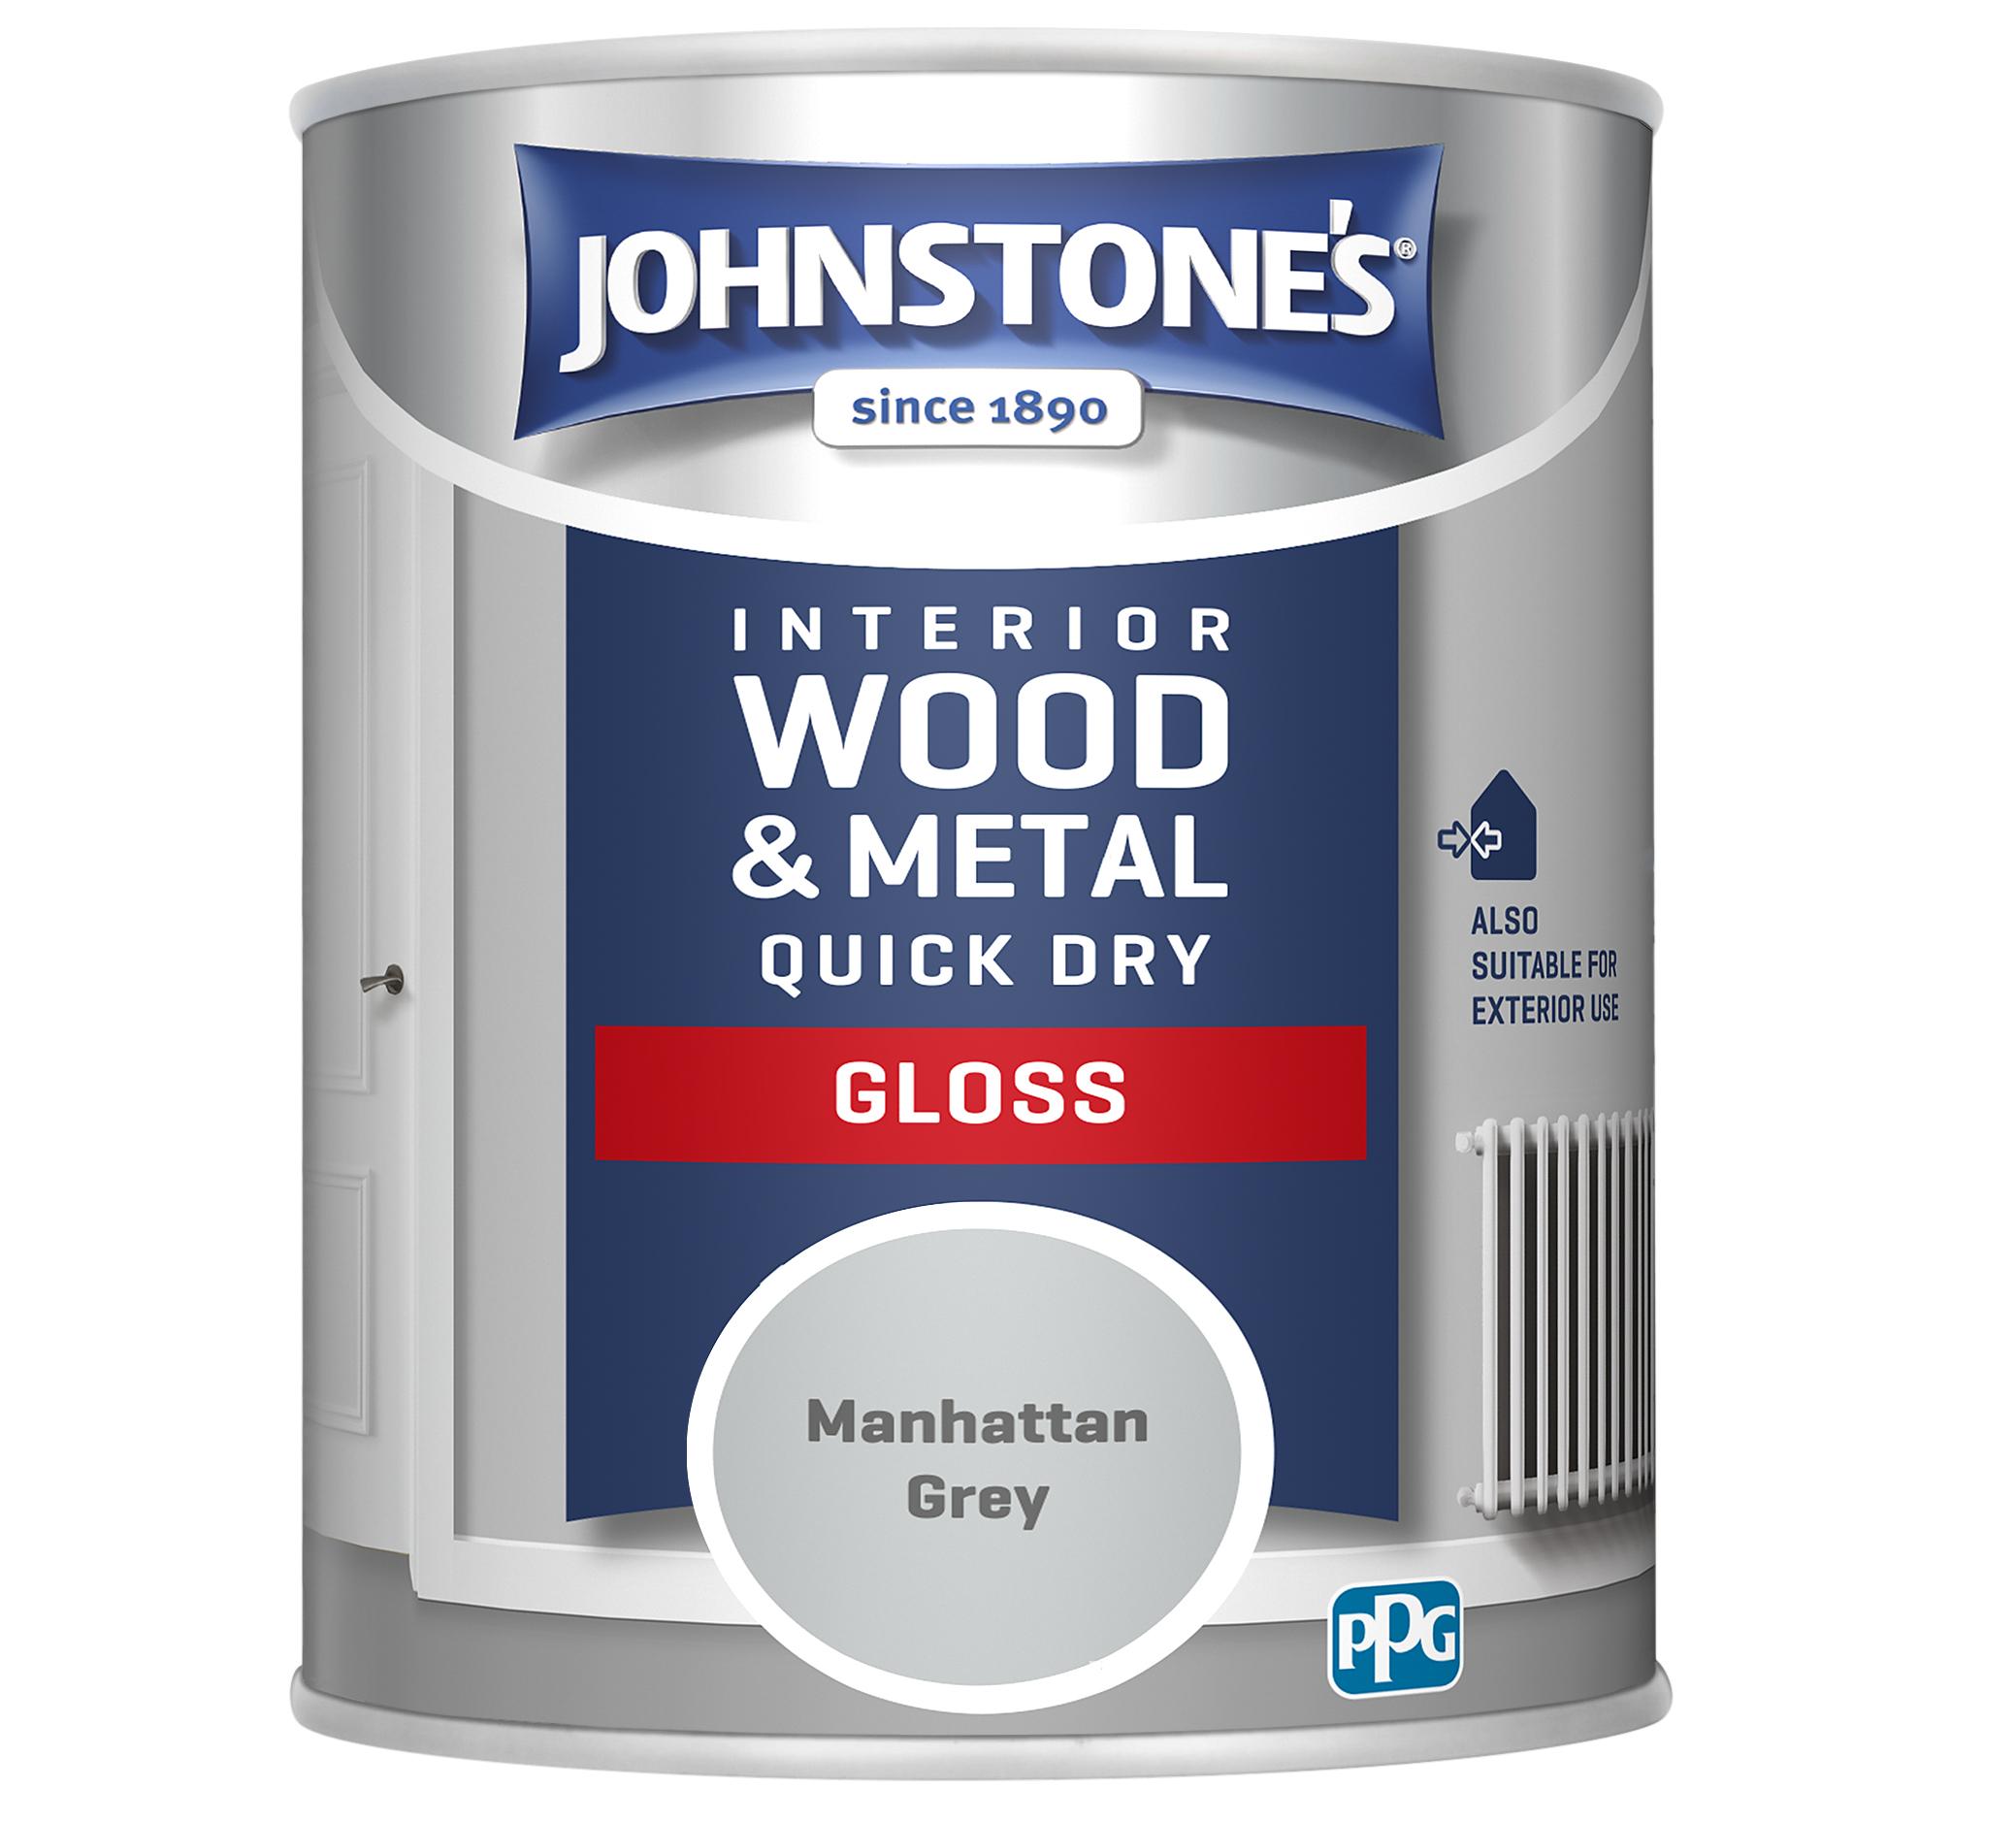 Johnstones 750ml Quick Dry Gloss Paint - Manhattan Grey